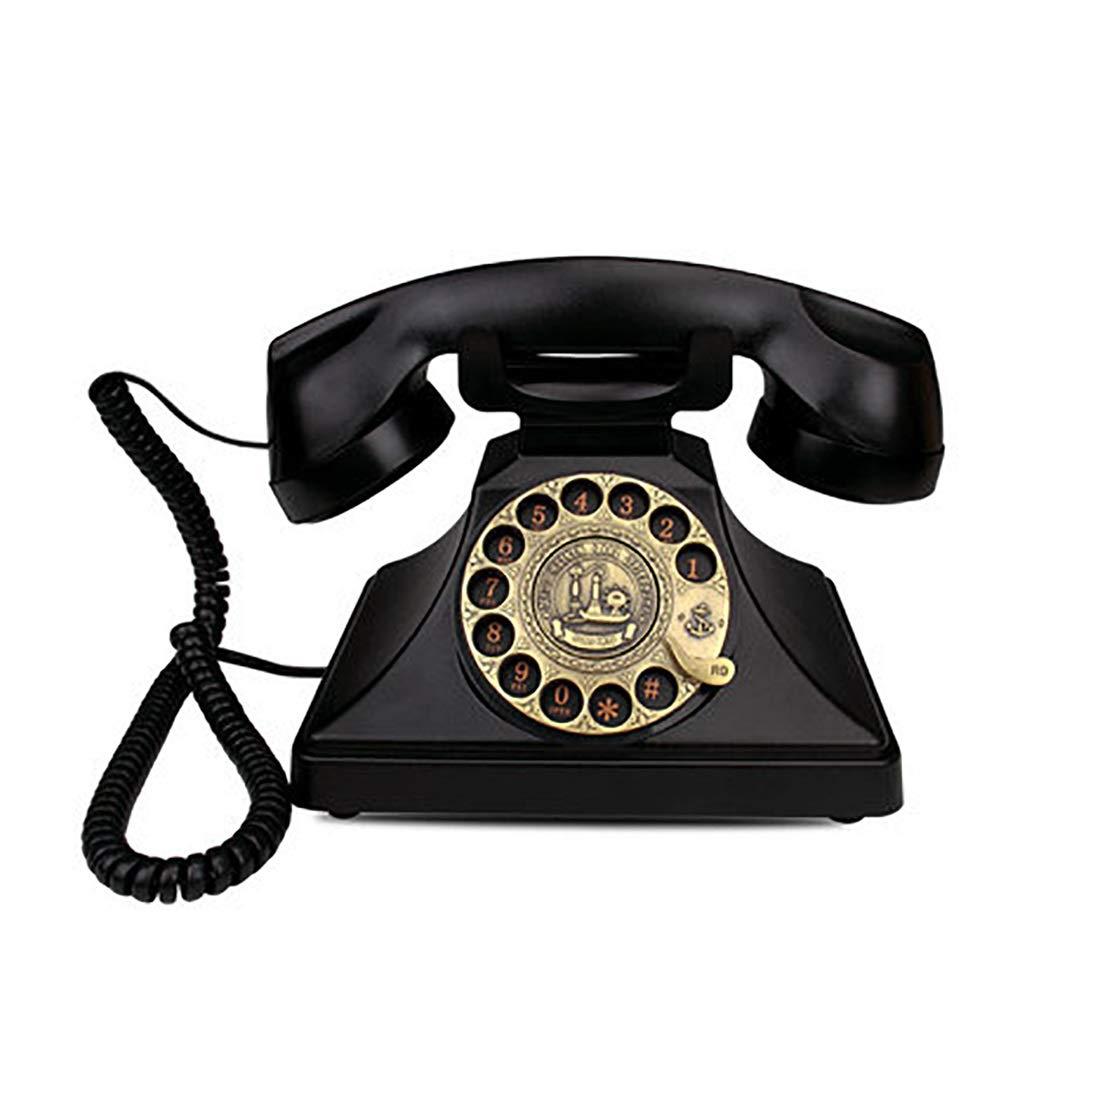 ZHILIAN European Retro Family Hotel Telephone Landline Fixed Telephone Decorative Telephone Rotary Dialing Free Portable Multi-Color Optional (Color : Black)